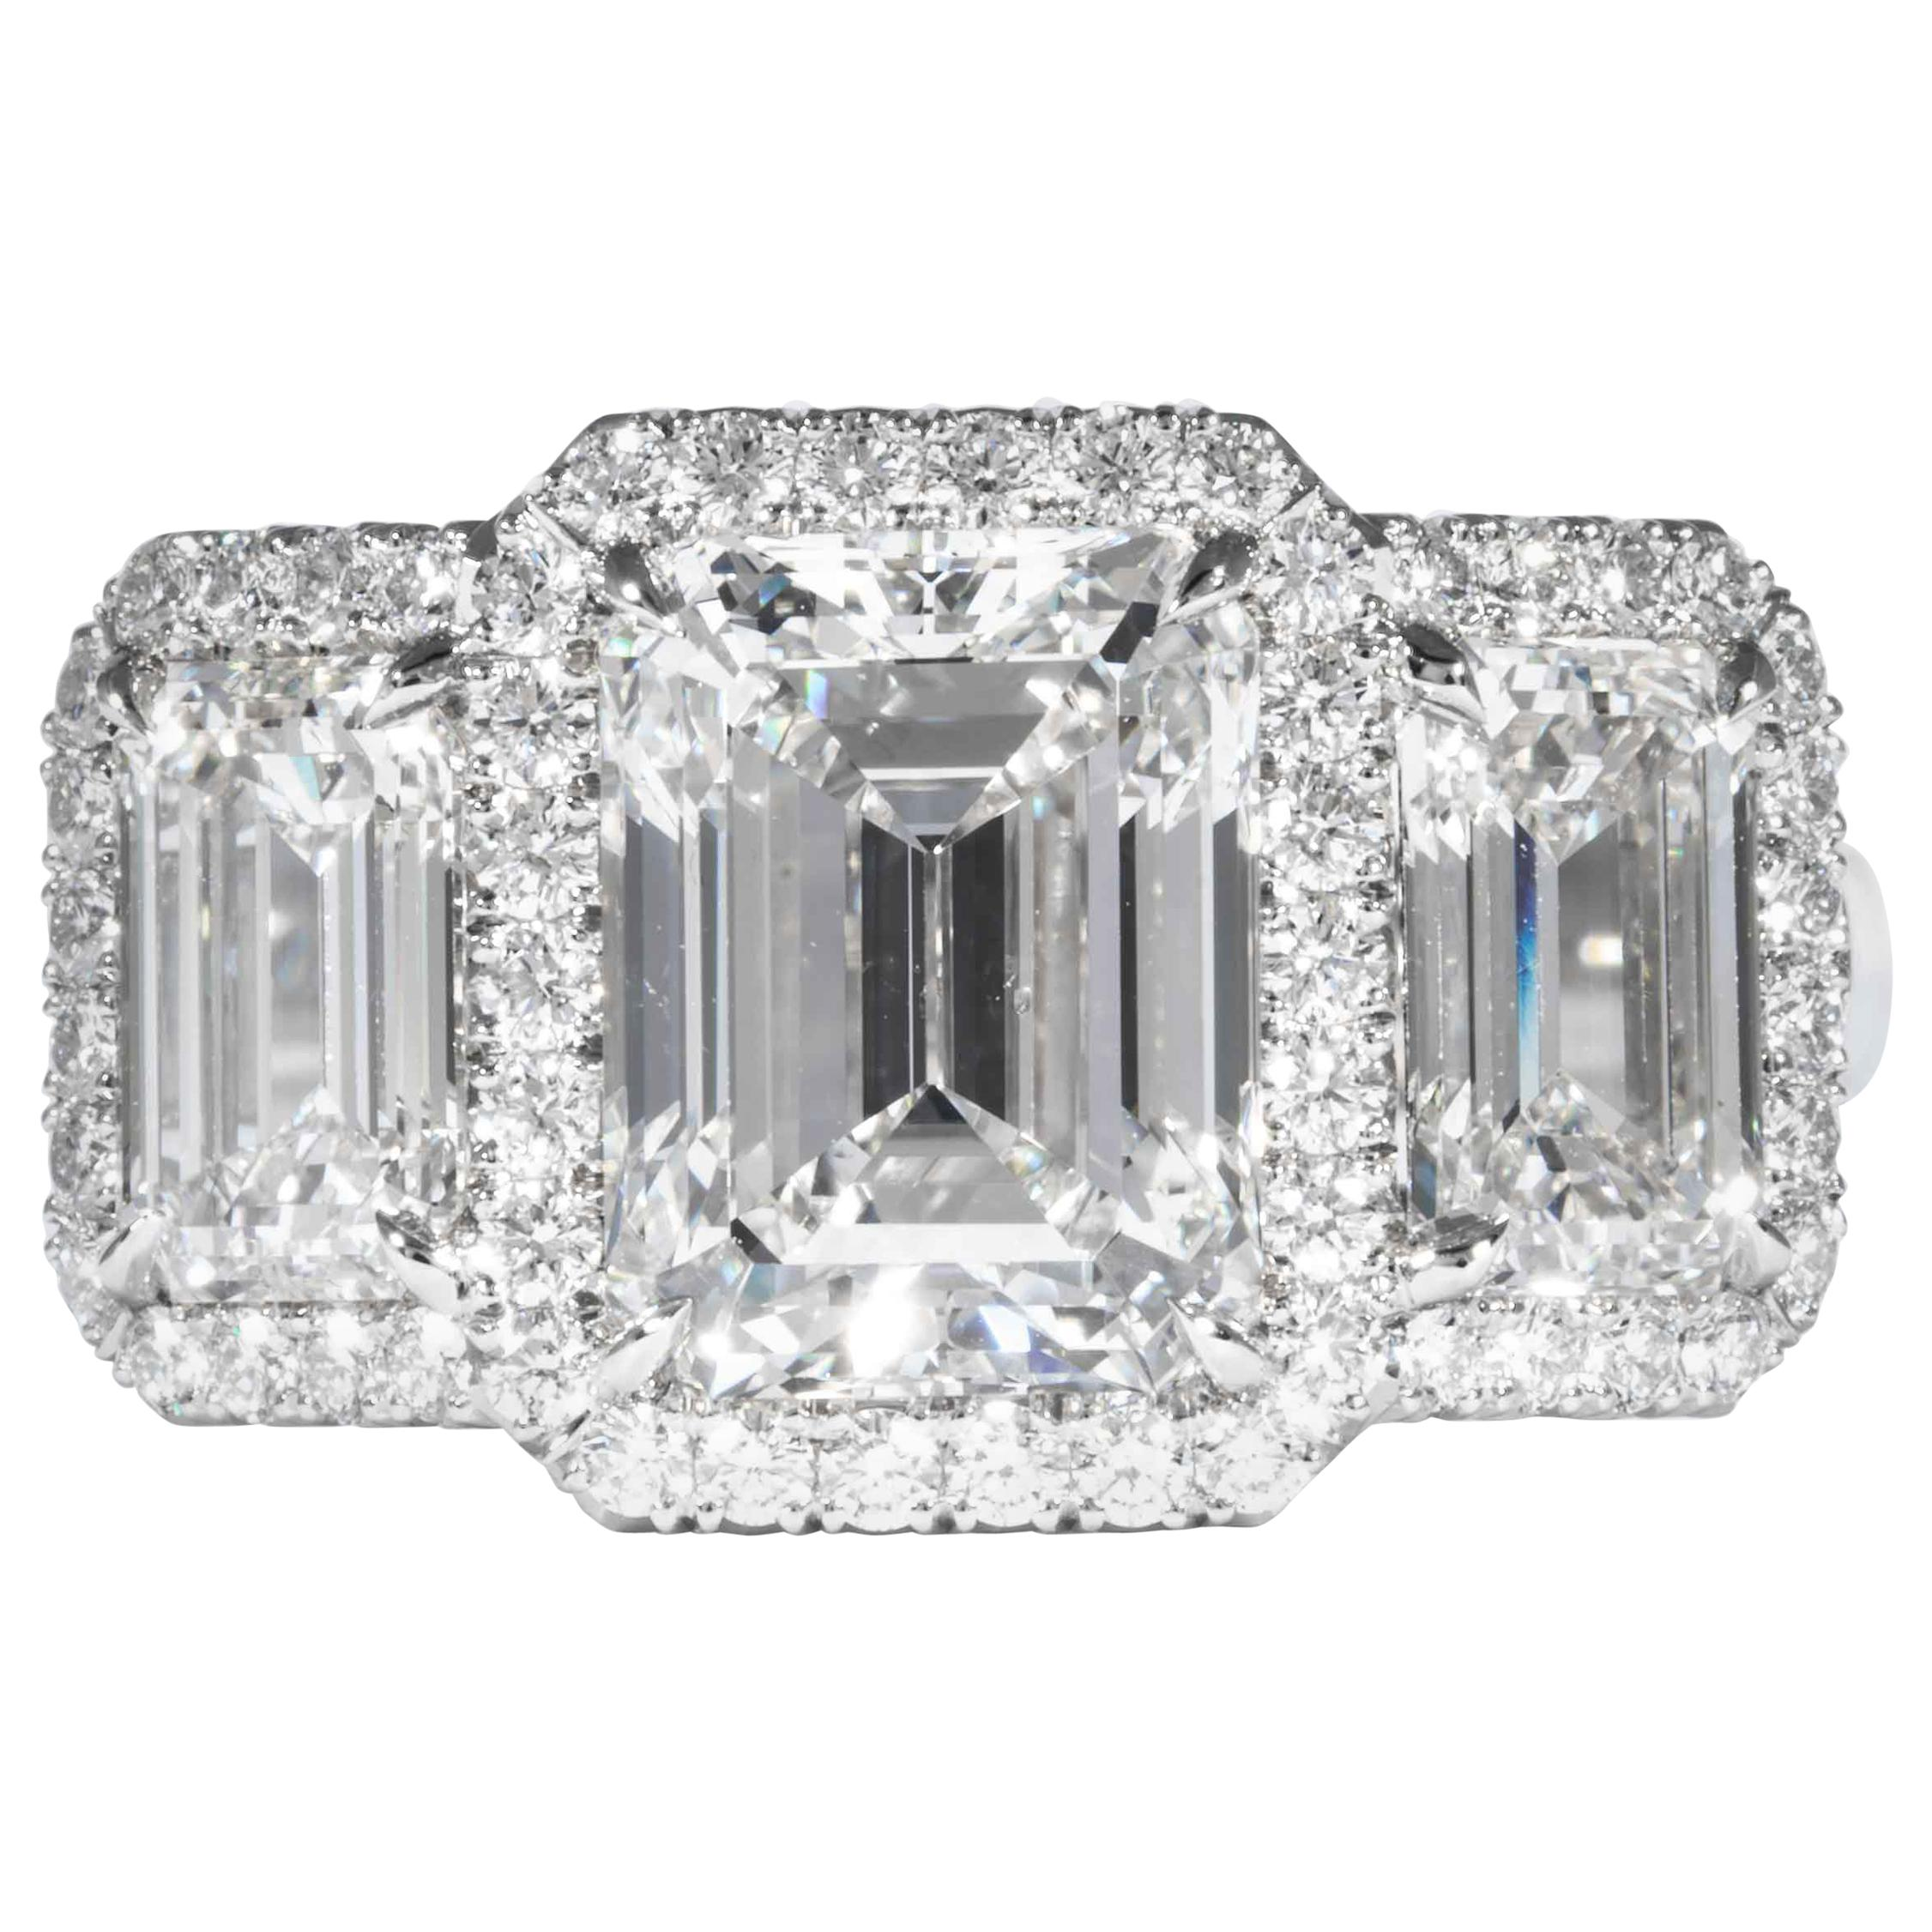 Shreve, Crump & Low GIA Certified 3.23 Carat G SI1 Emerald Cut Diamond Ring